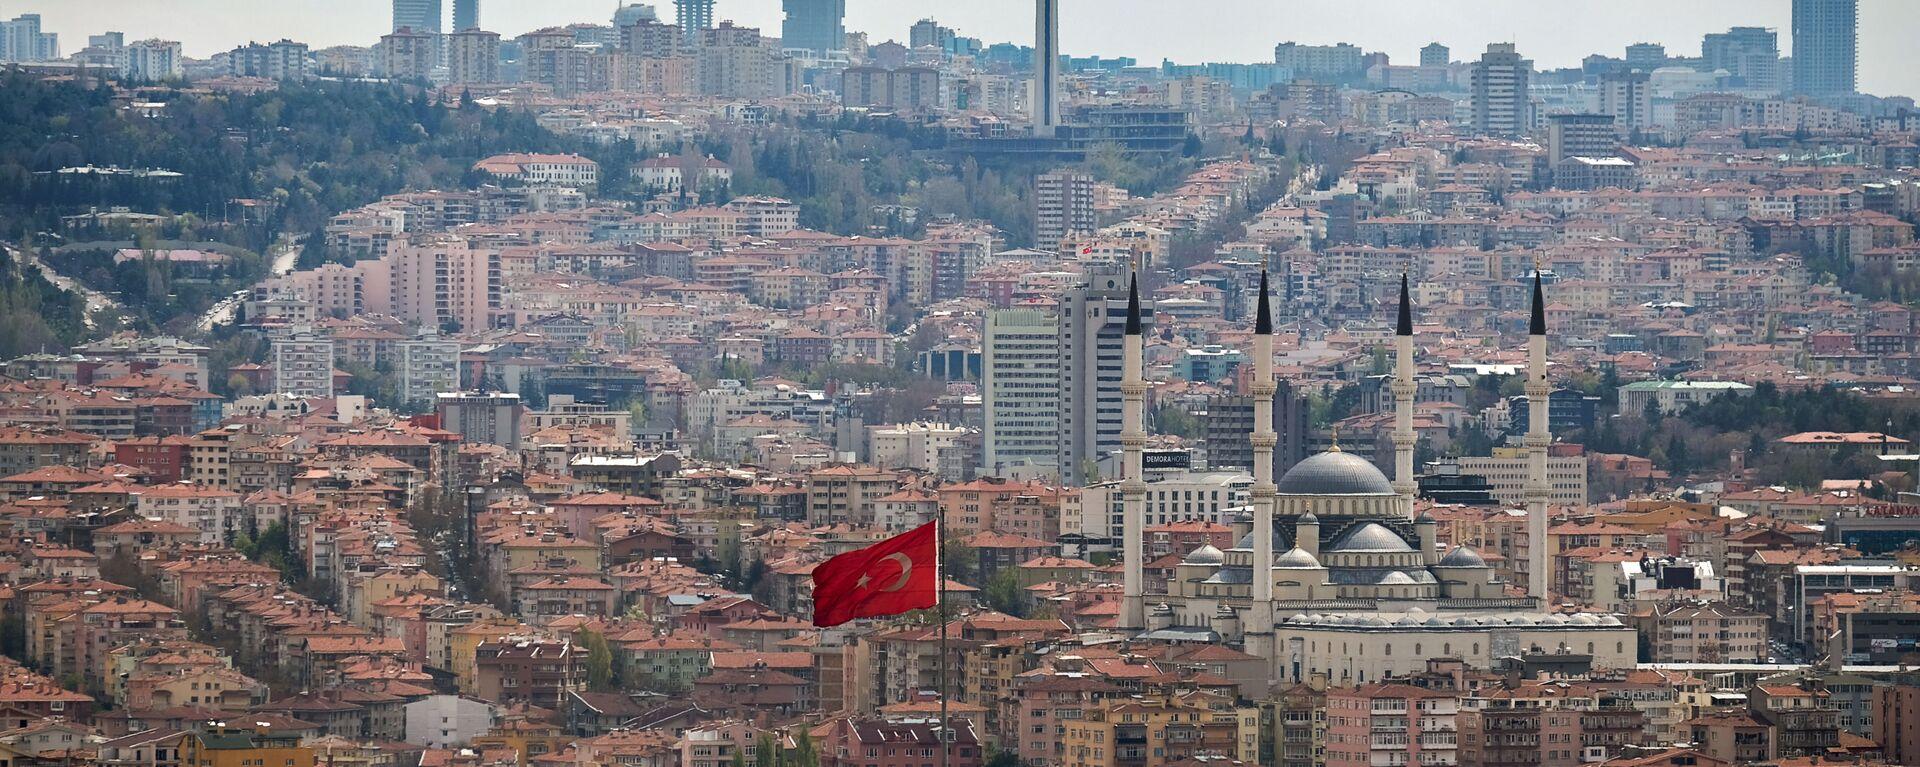 Ankara. Turcja - Sputnik Polska, 1920, 01.08.2021